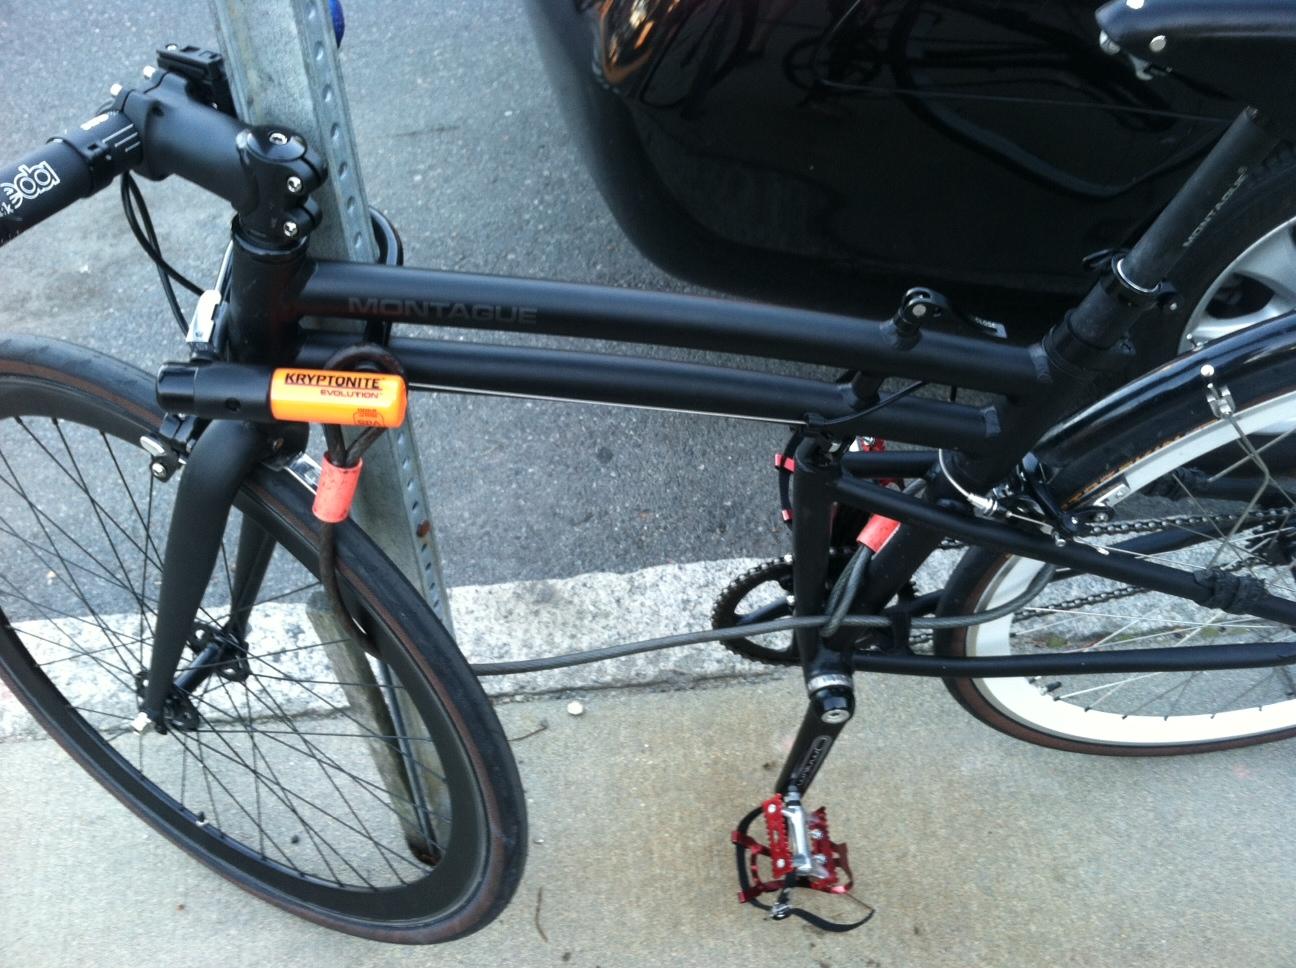 locking the folding bike